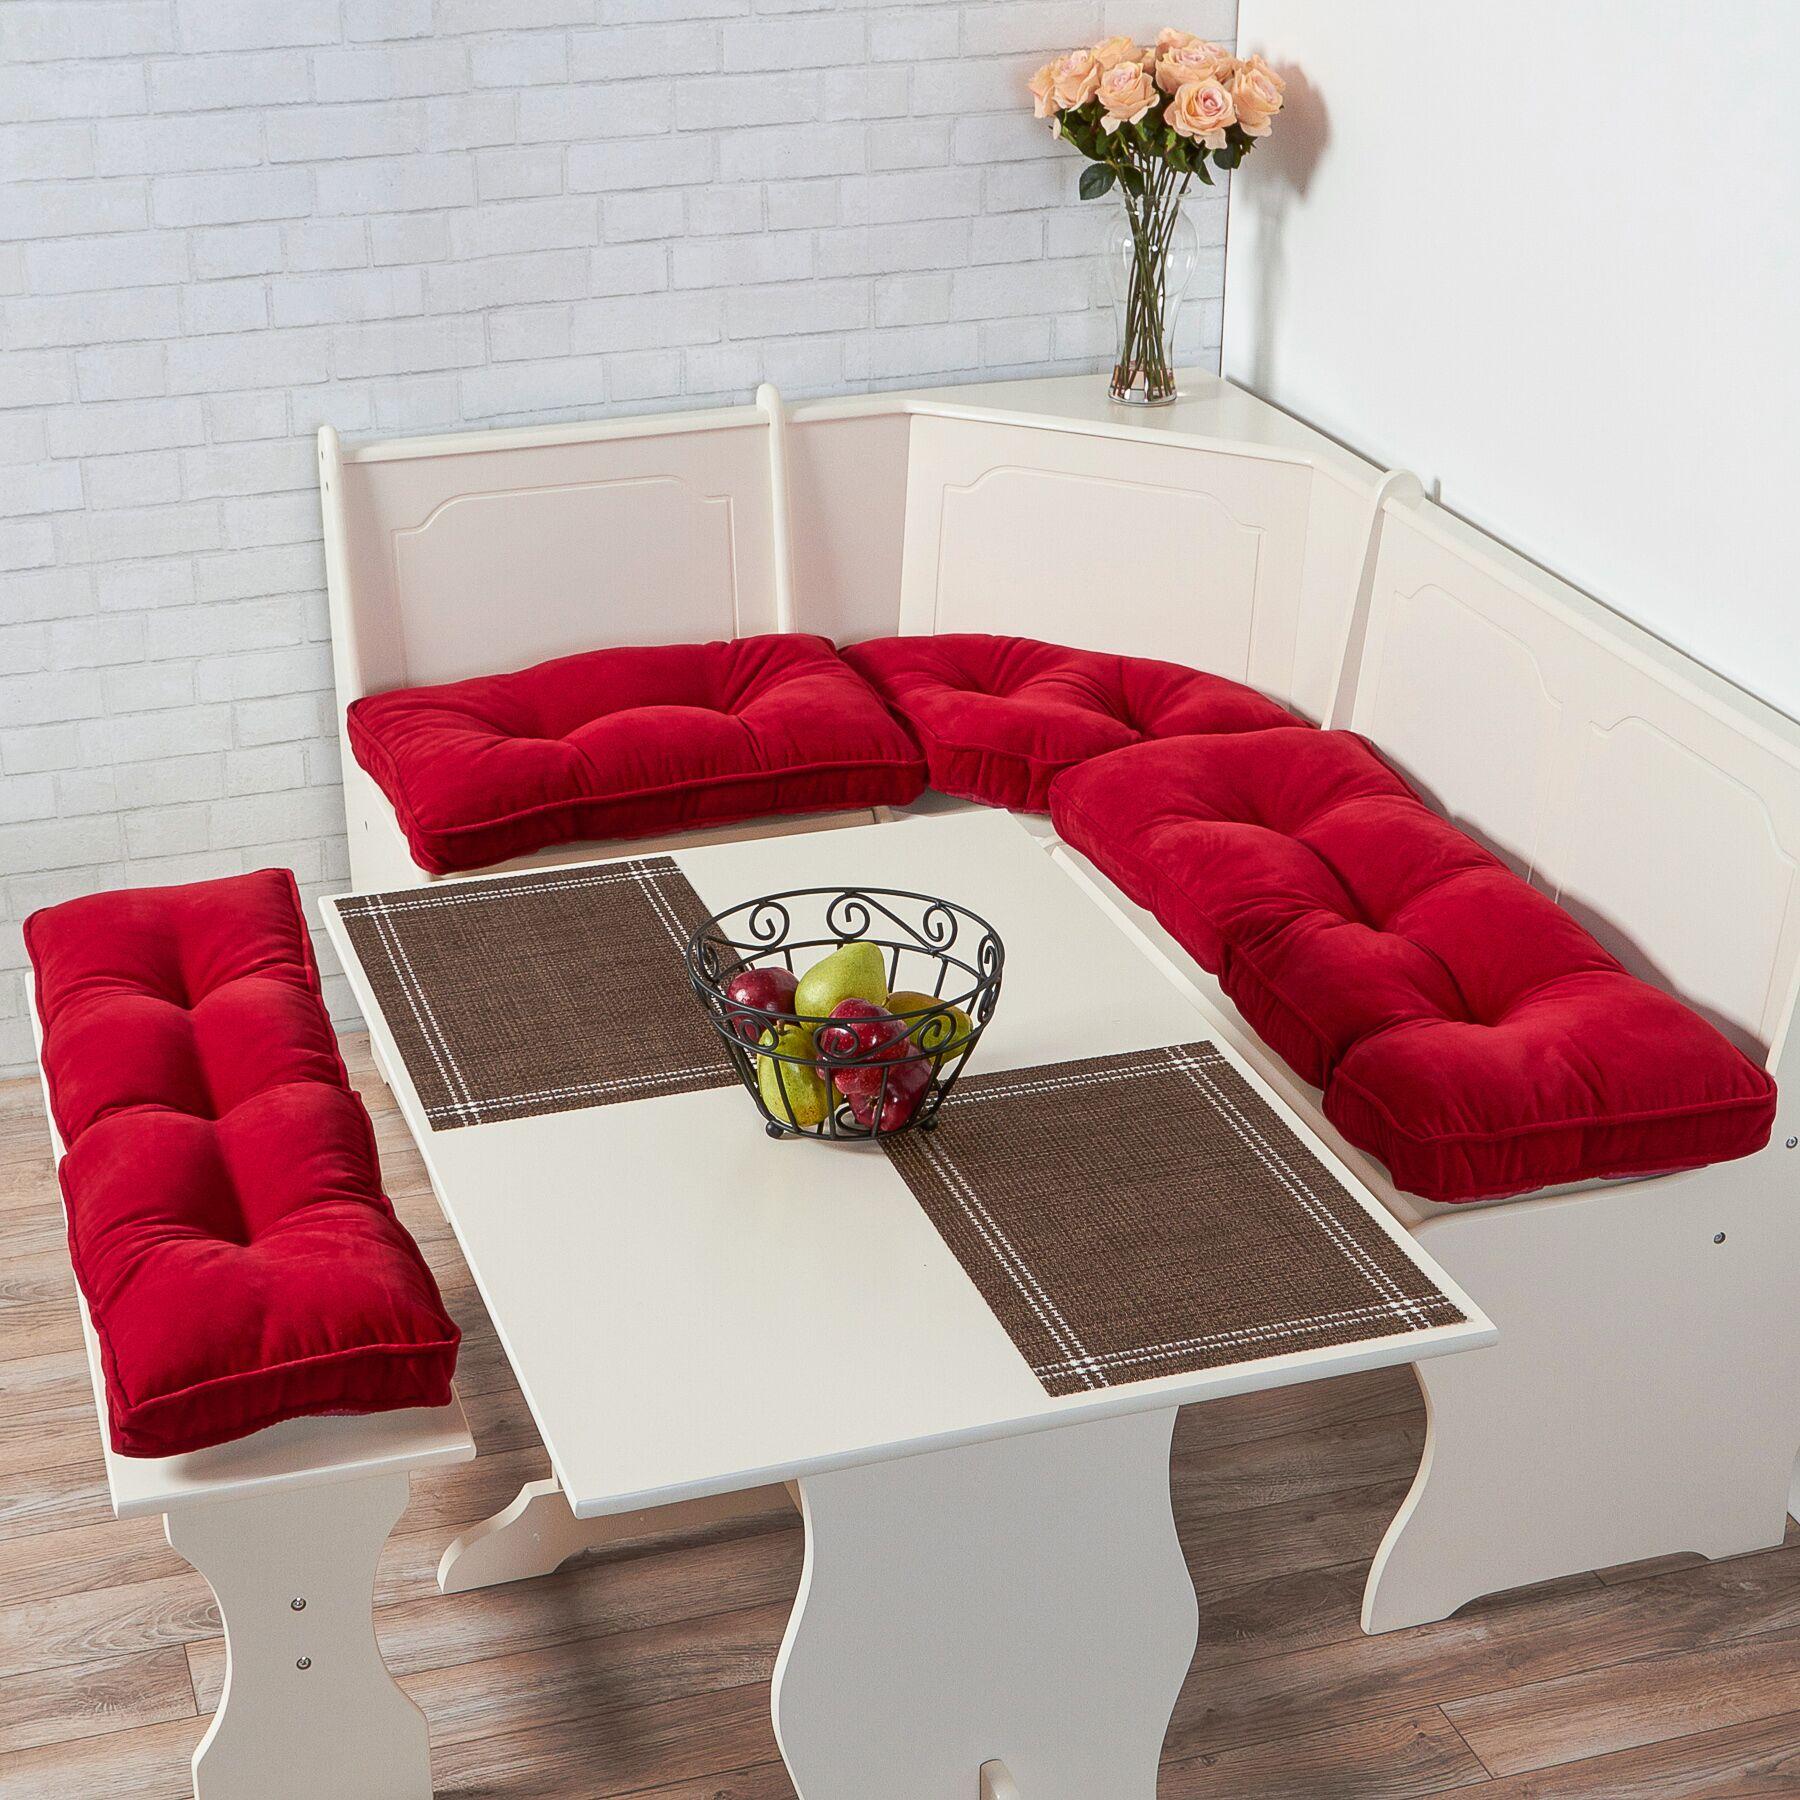 Joie 4 Piece Bench Cushion Set Fabric: Scarlet